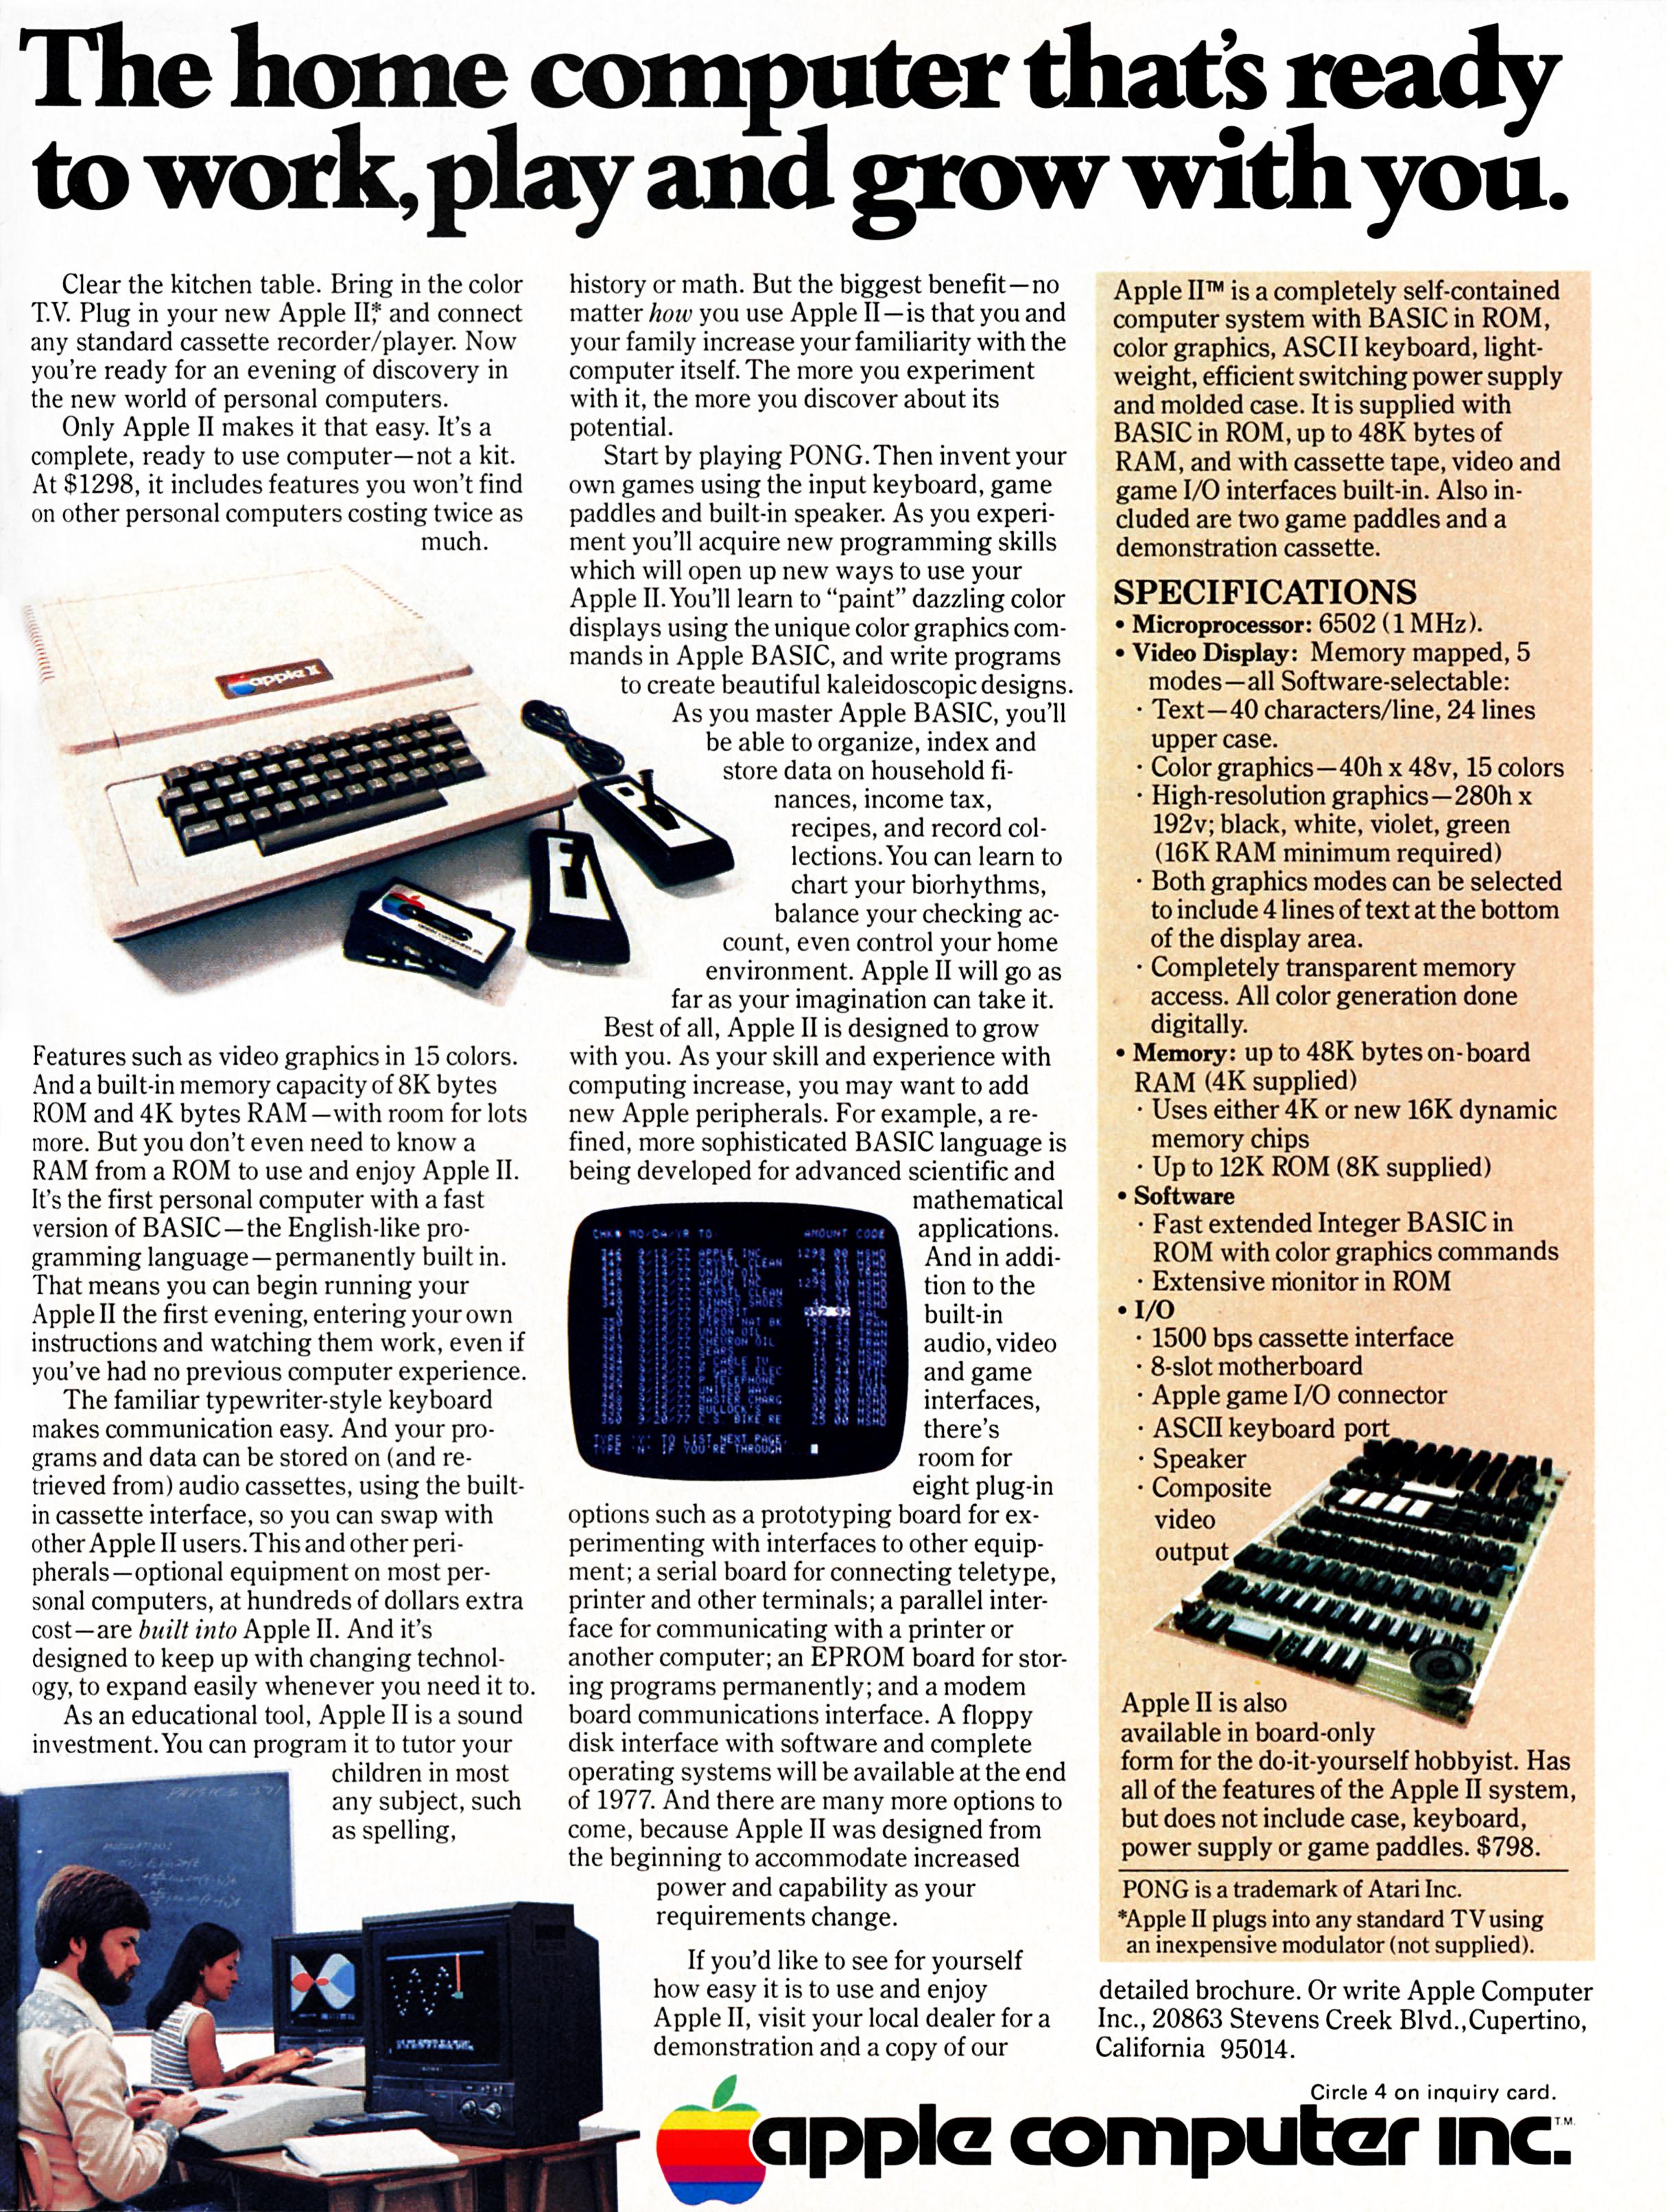 Apple_II_advertisement_Dec_1977_page_2.jpg